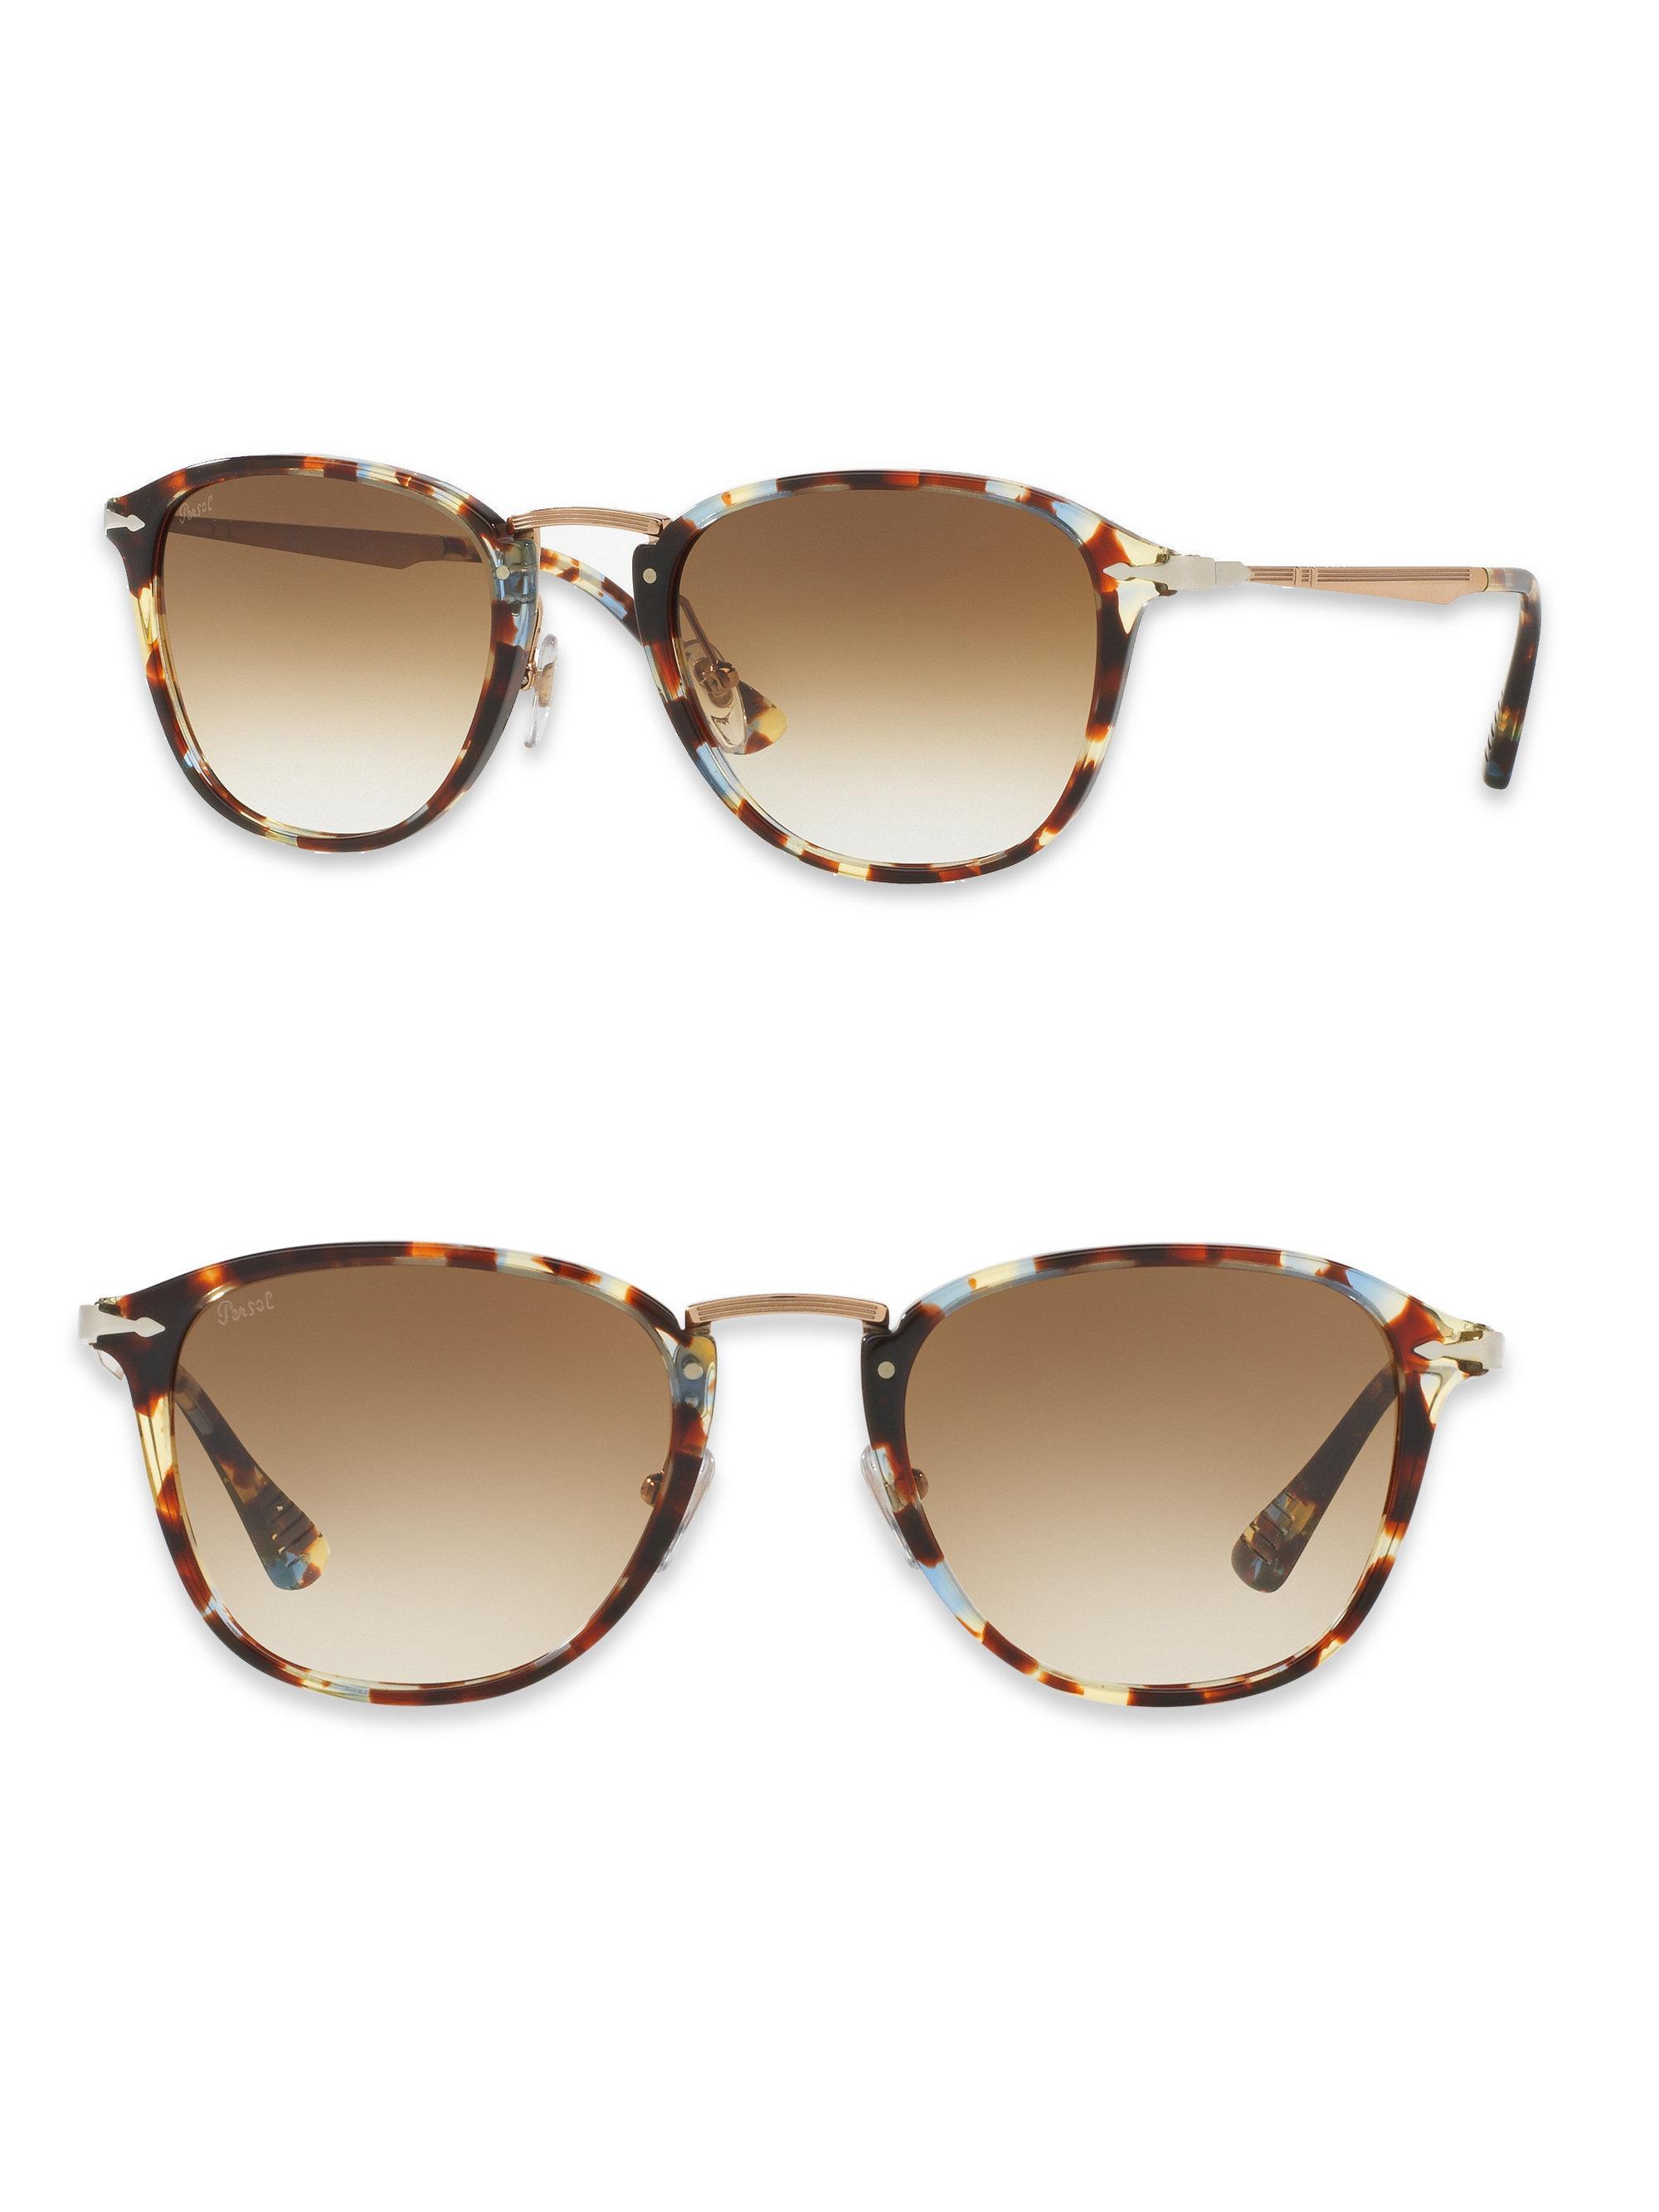 f278c012ec Lyst - Persol Calligrapher 52mm Square Sunglasses in Brown for Men